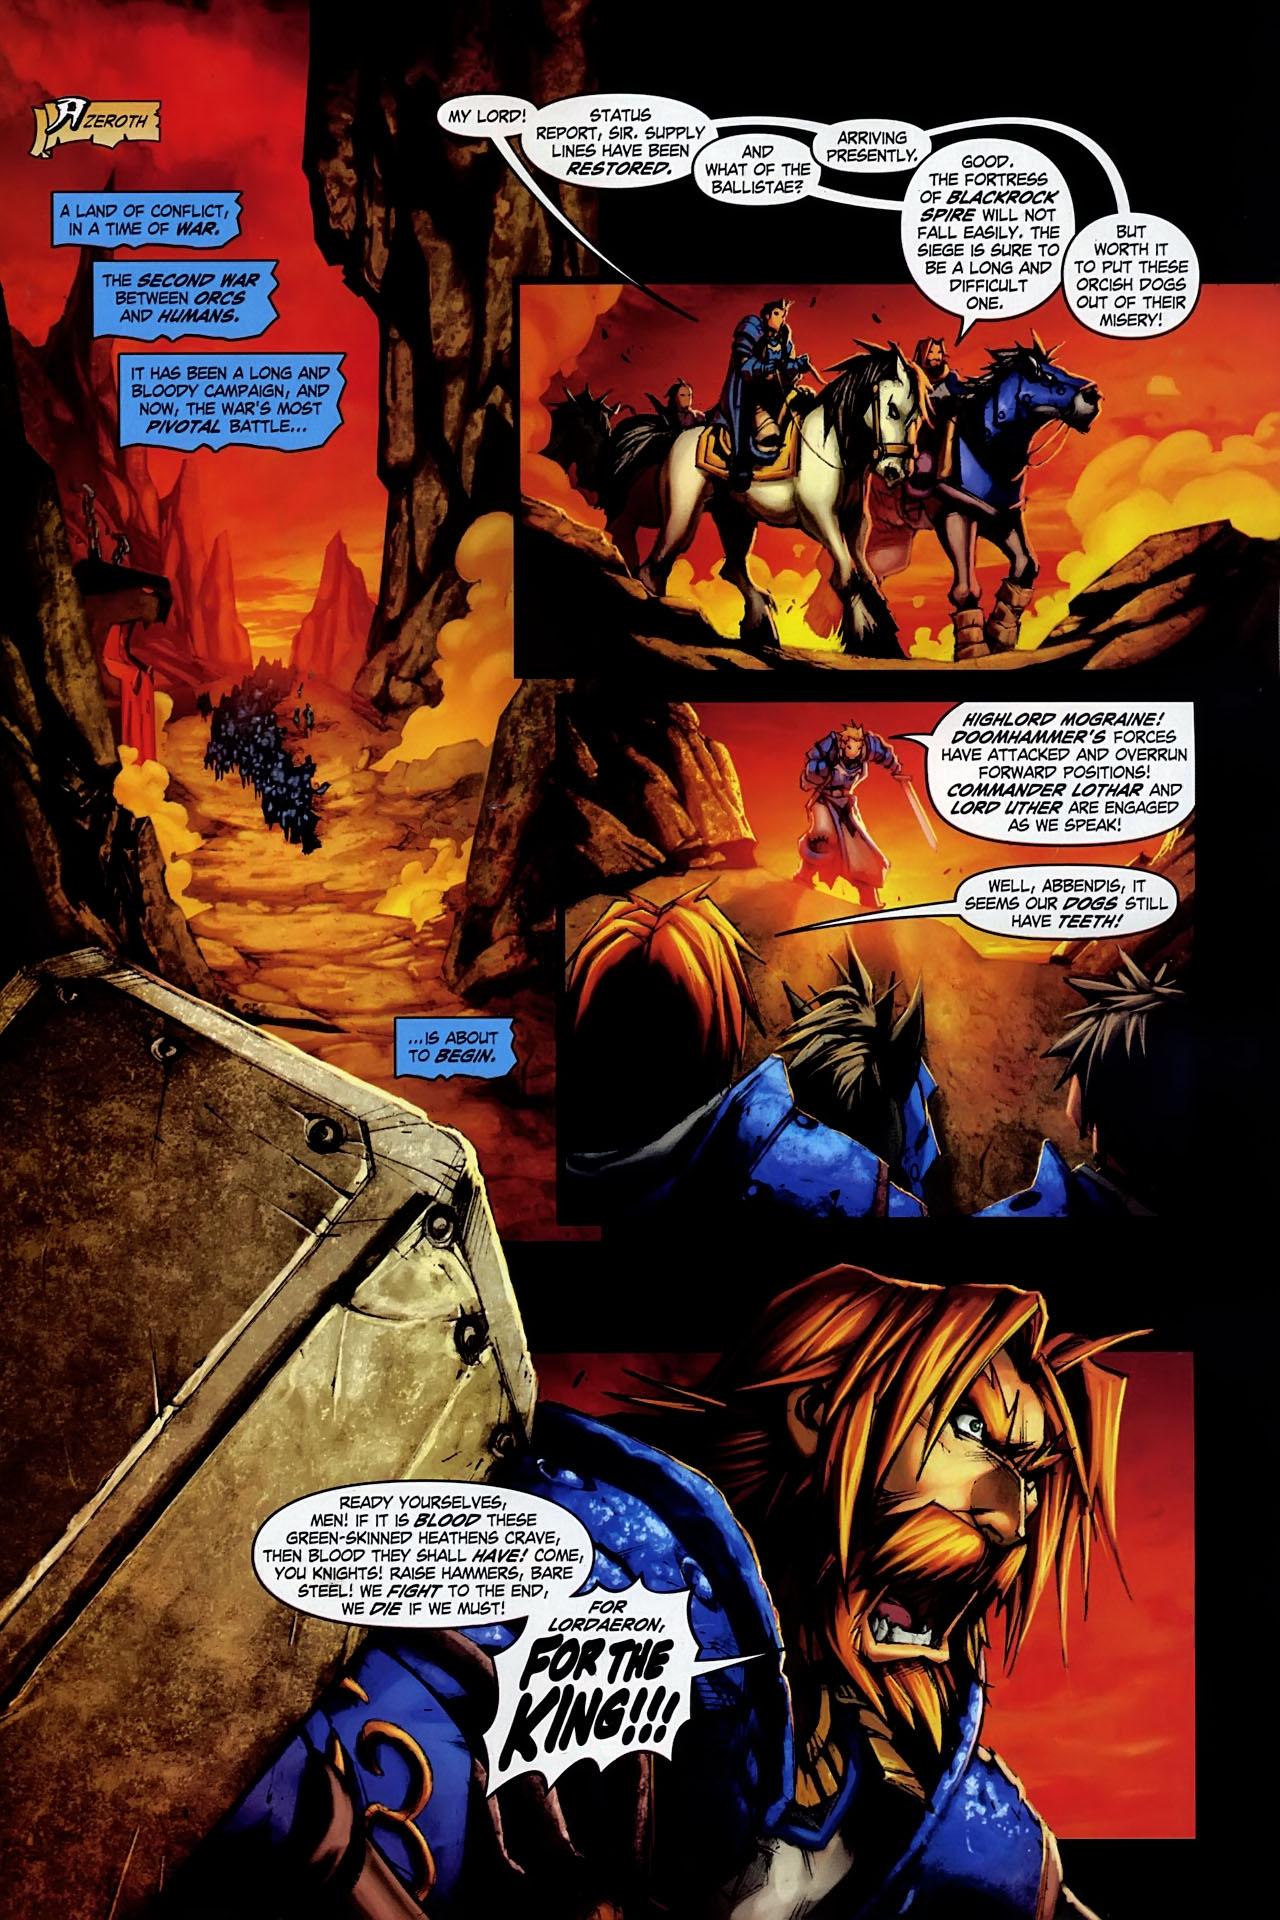 Read online World of Warcraft: Ashbringer comic -  Issue #1 - 2